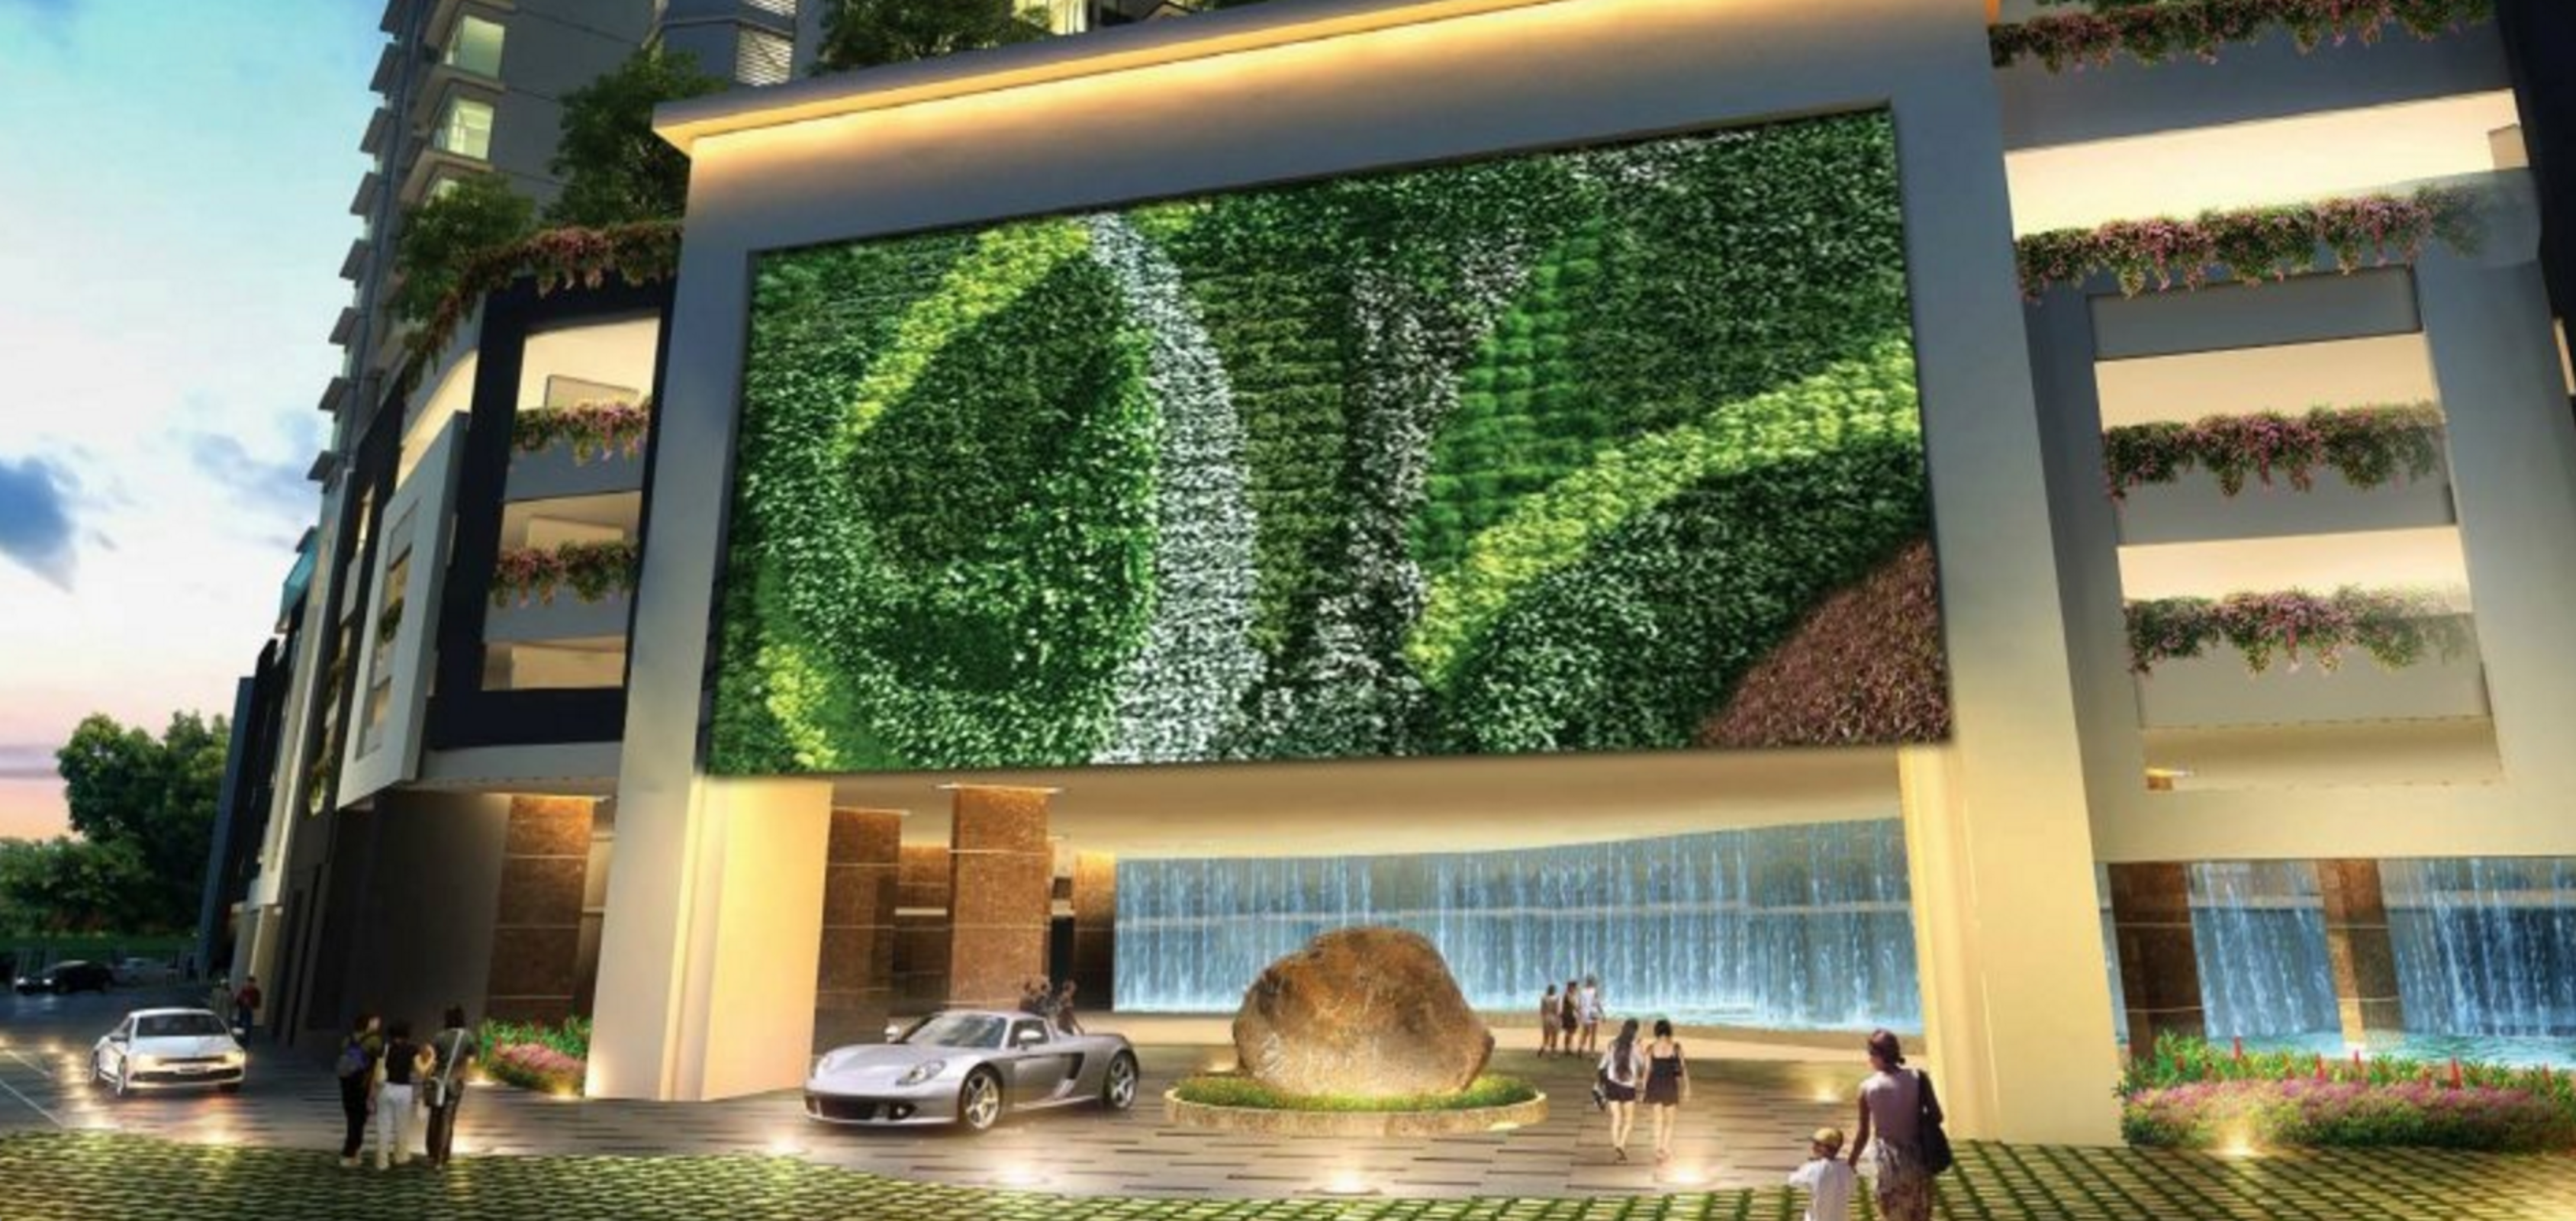 The clovers propsocial property condominium penang cover video